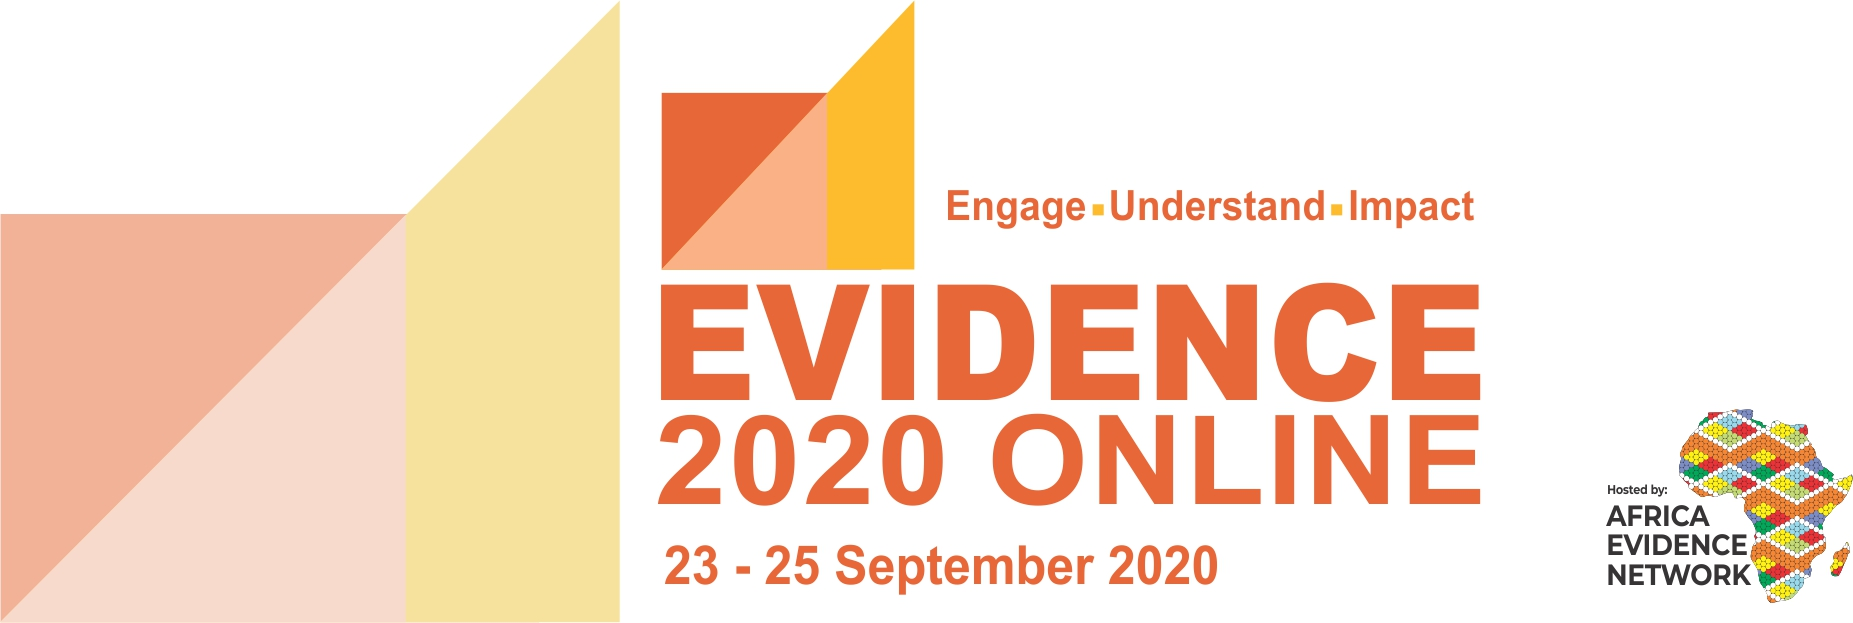 EVIDENCE 2020 ONLINE